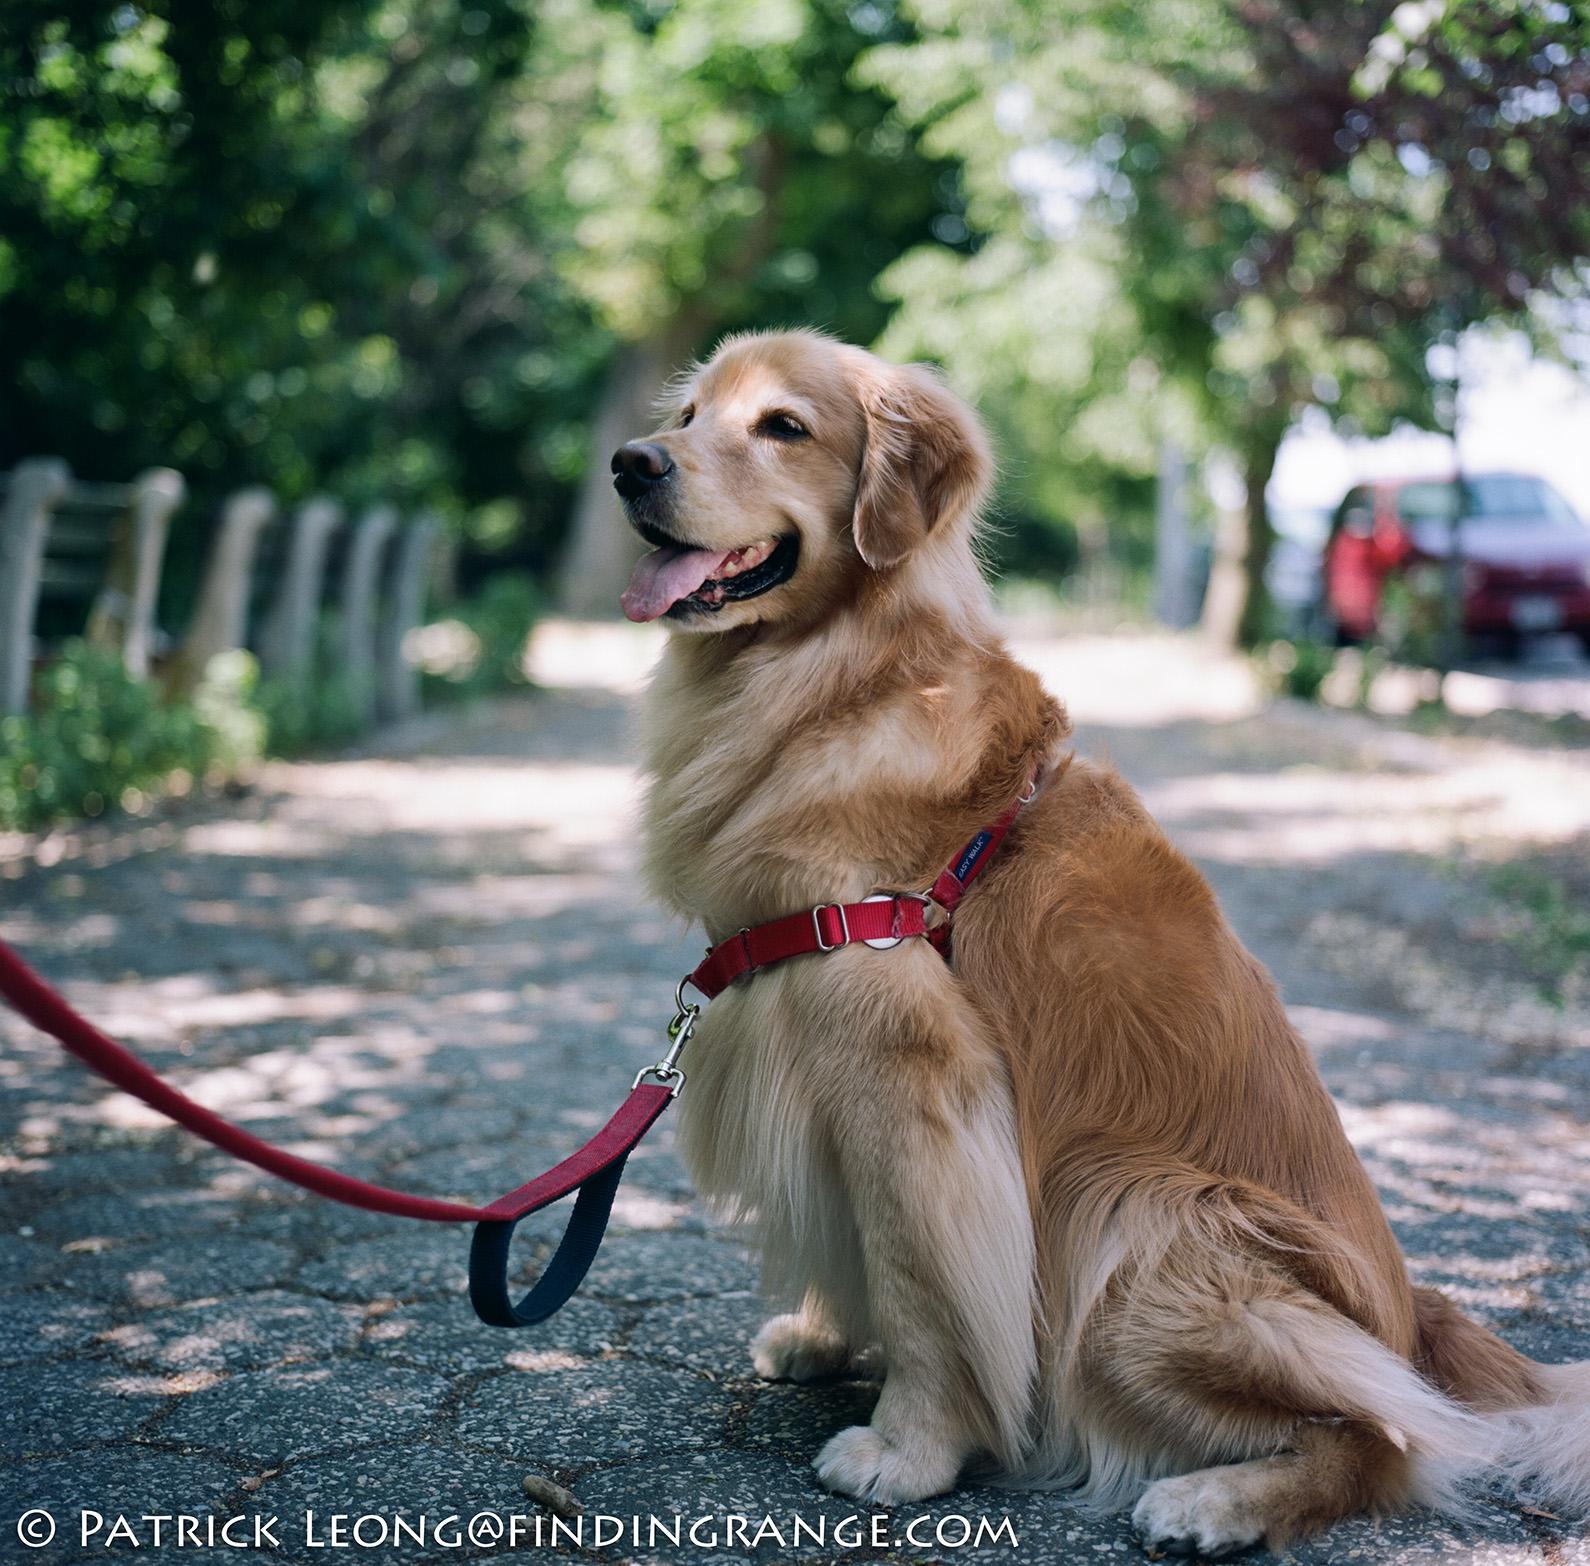 Hasselblad-503cw-Millennium-80mm-Planar-New-York-City-Bayridge-Shore-Road-Golden-Retriever-Dog